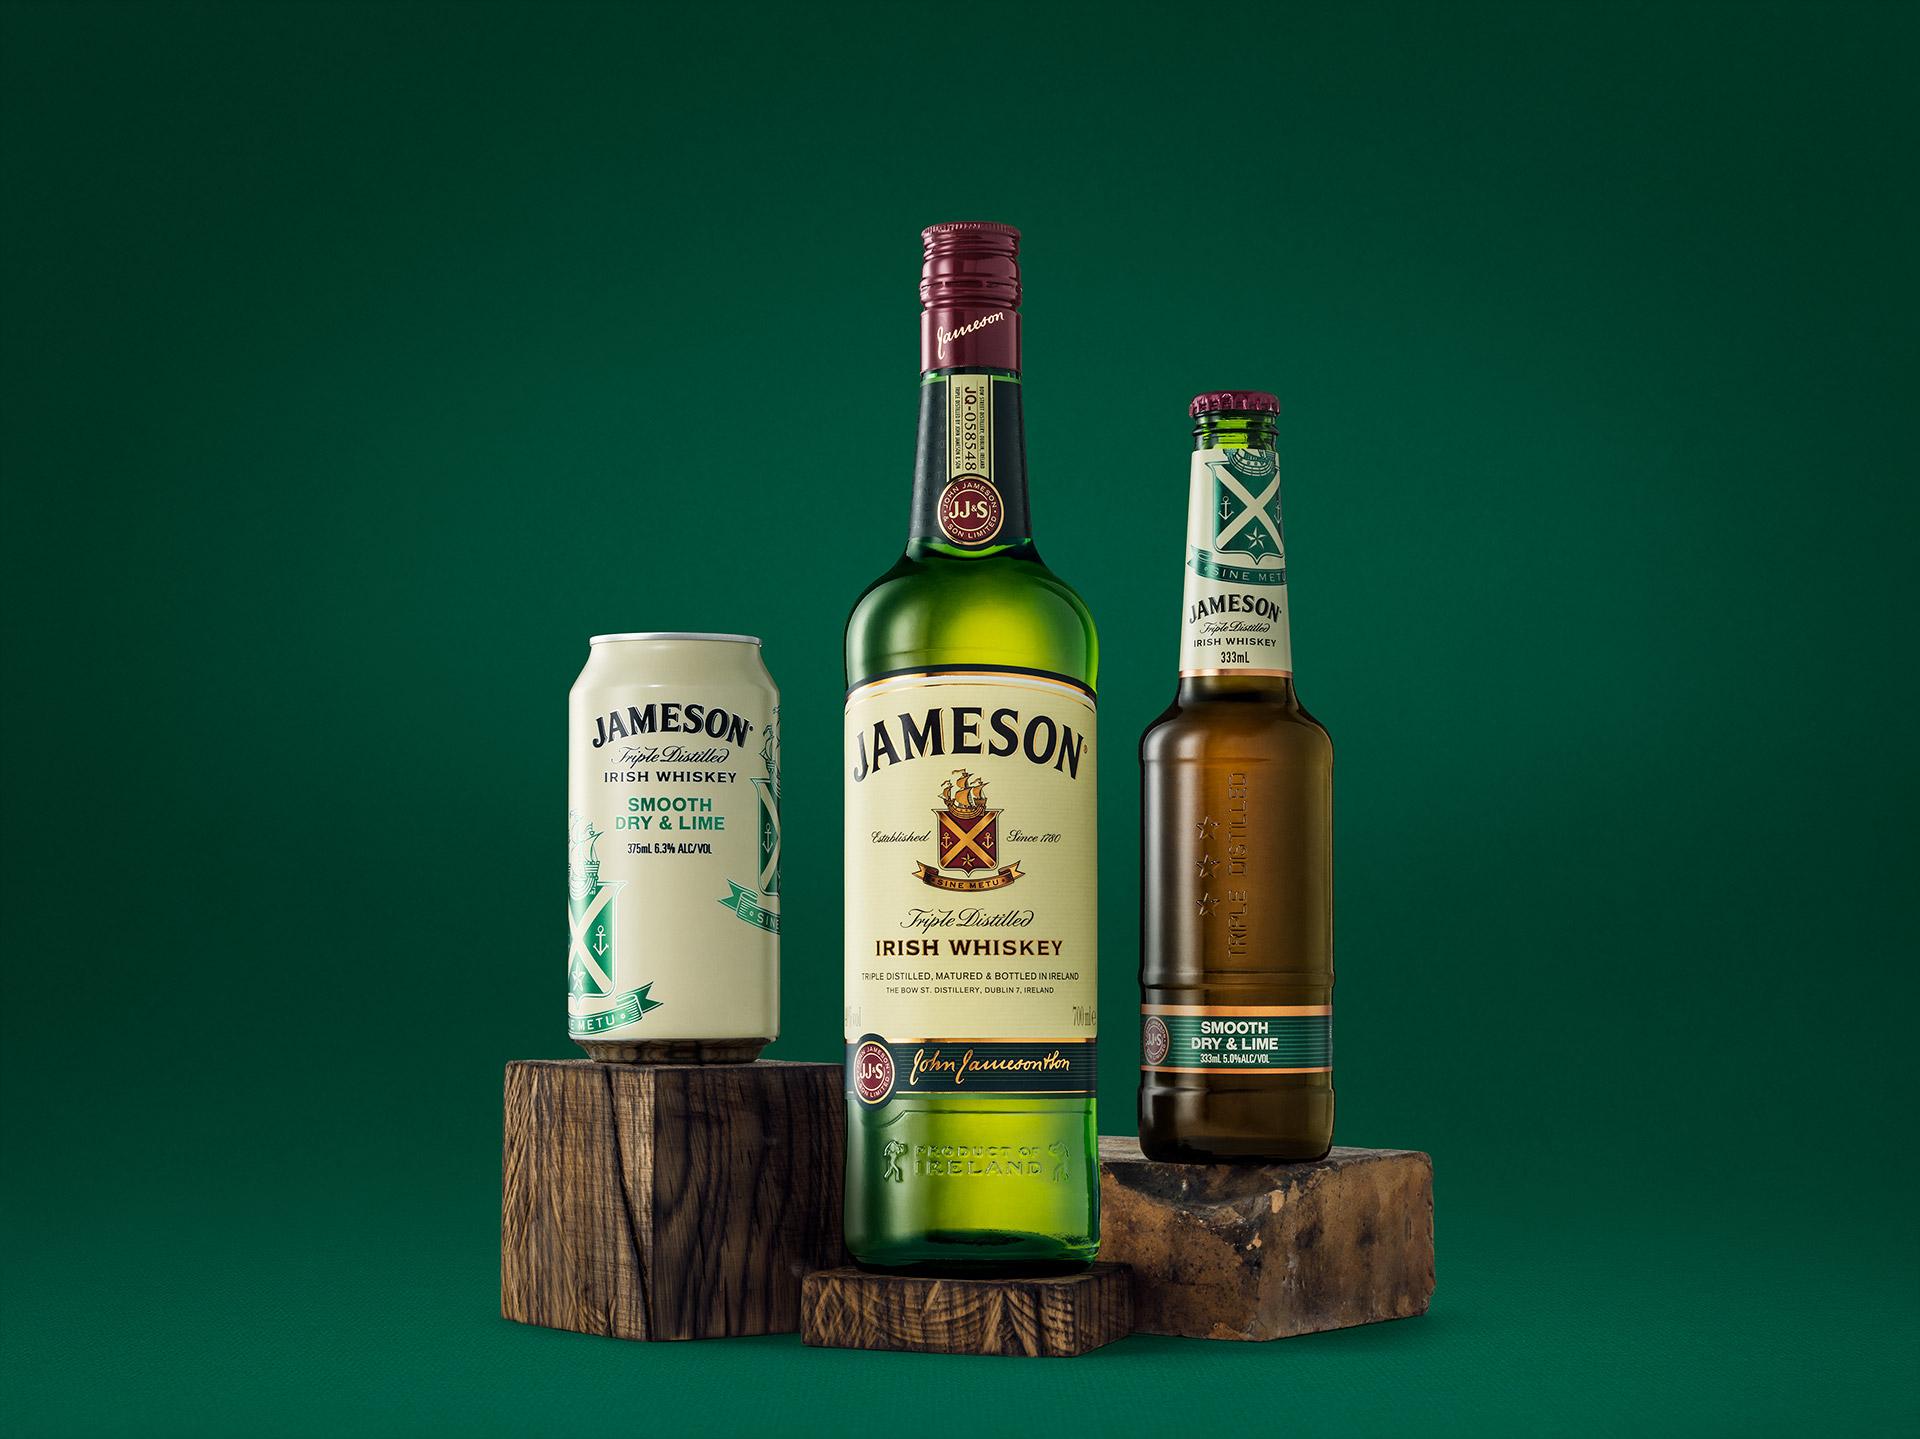 jameson_corporate_australia_rtd_green_WEB.jpg